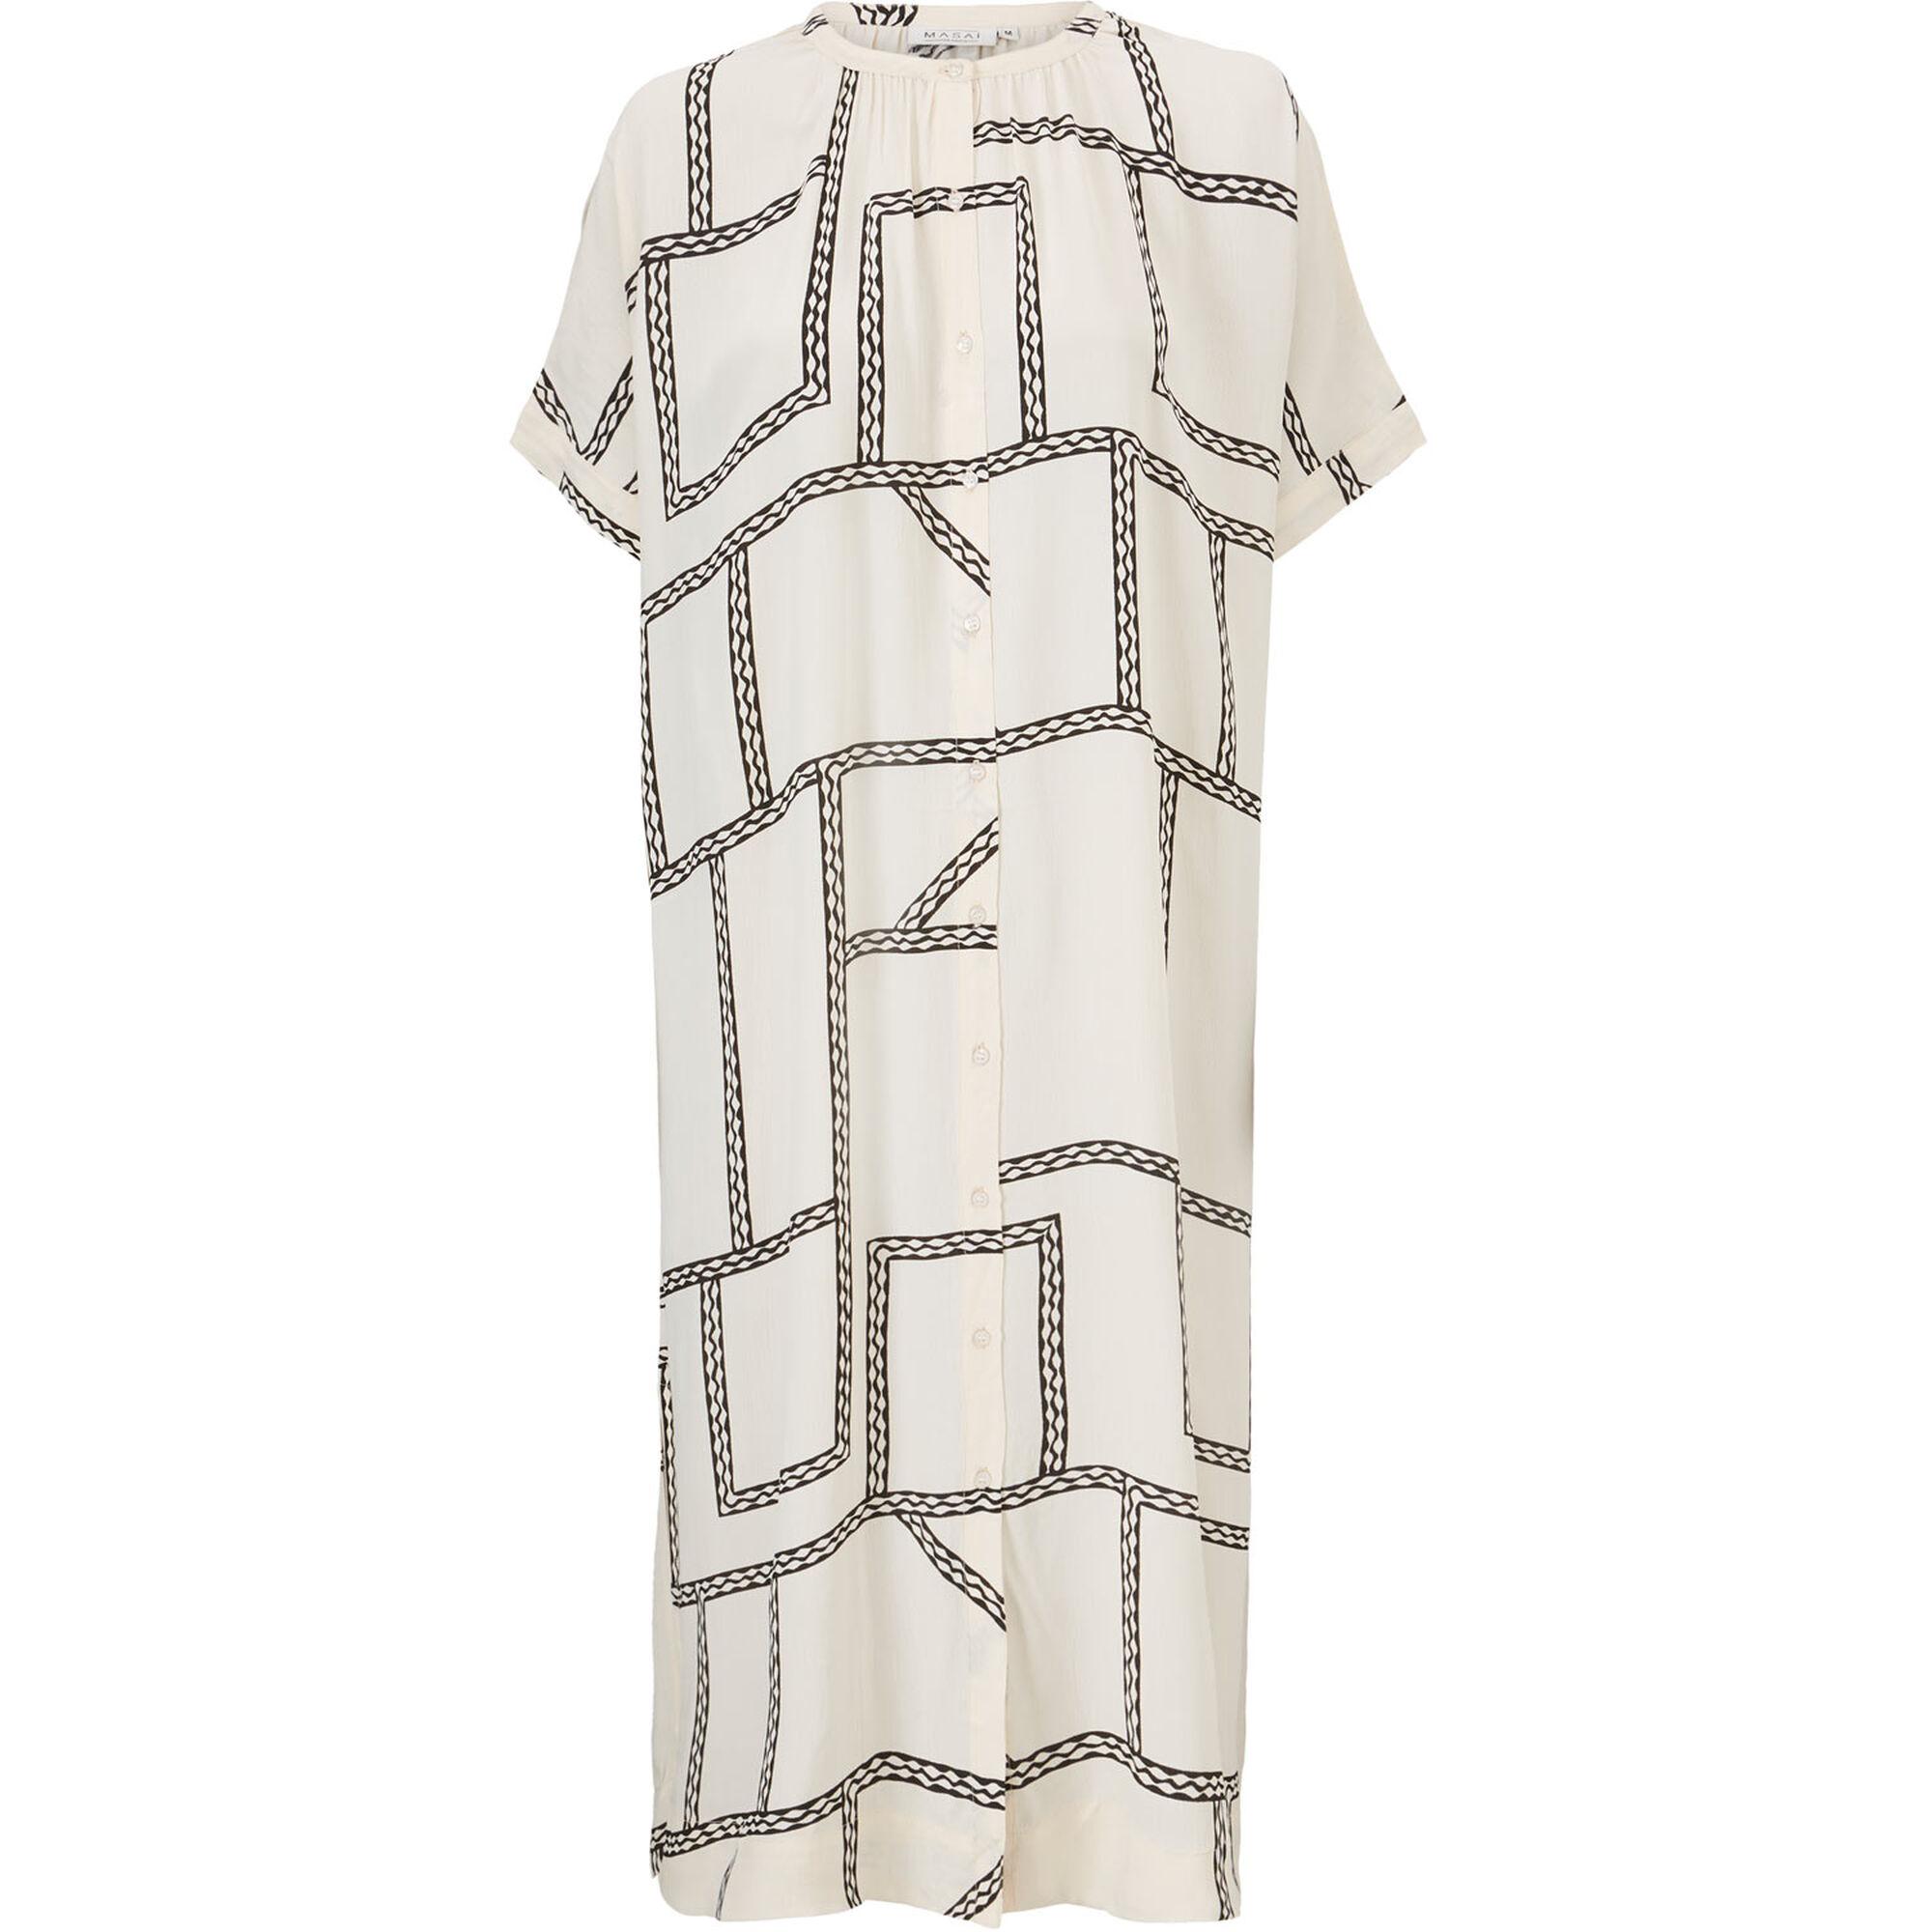 ONORA SHIRT DRESS, Whitecap, hi-res